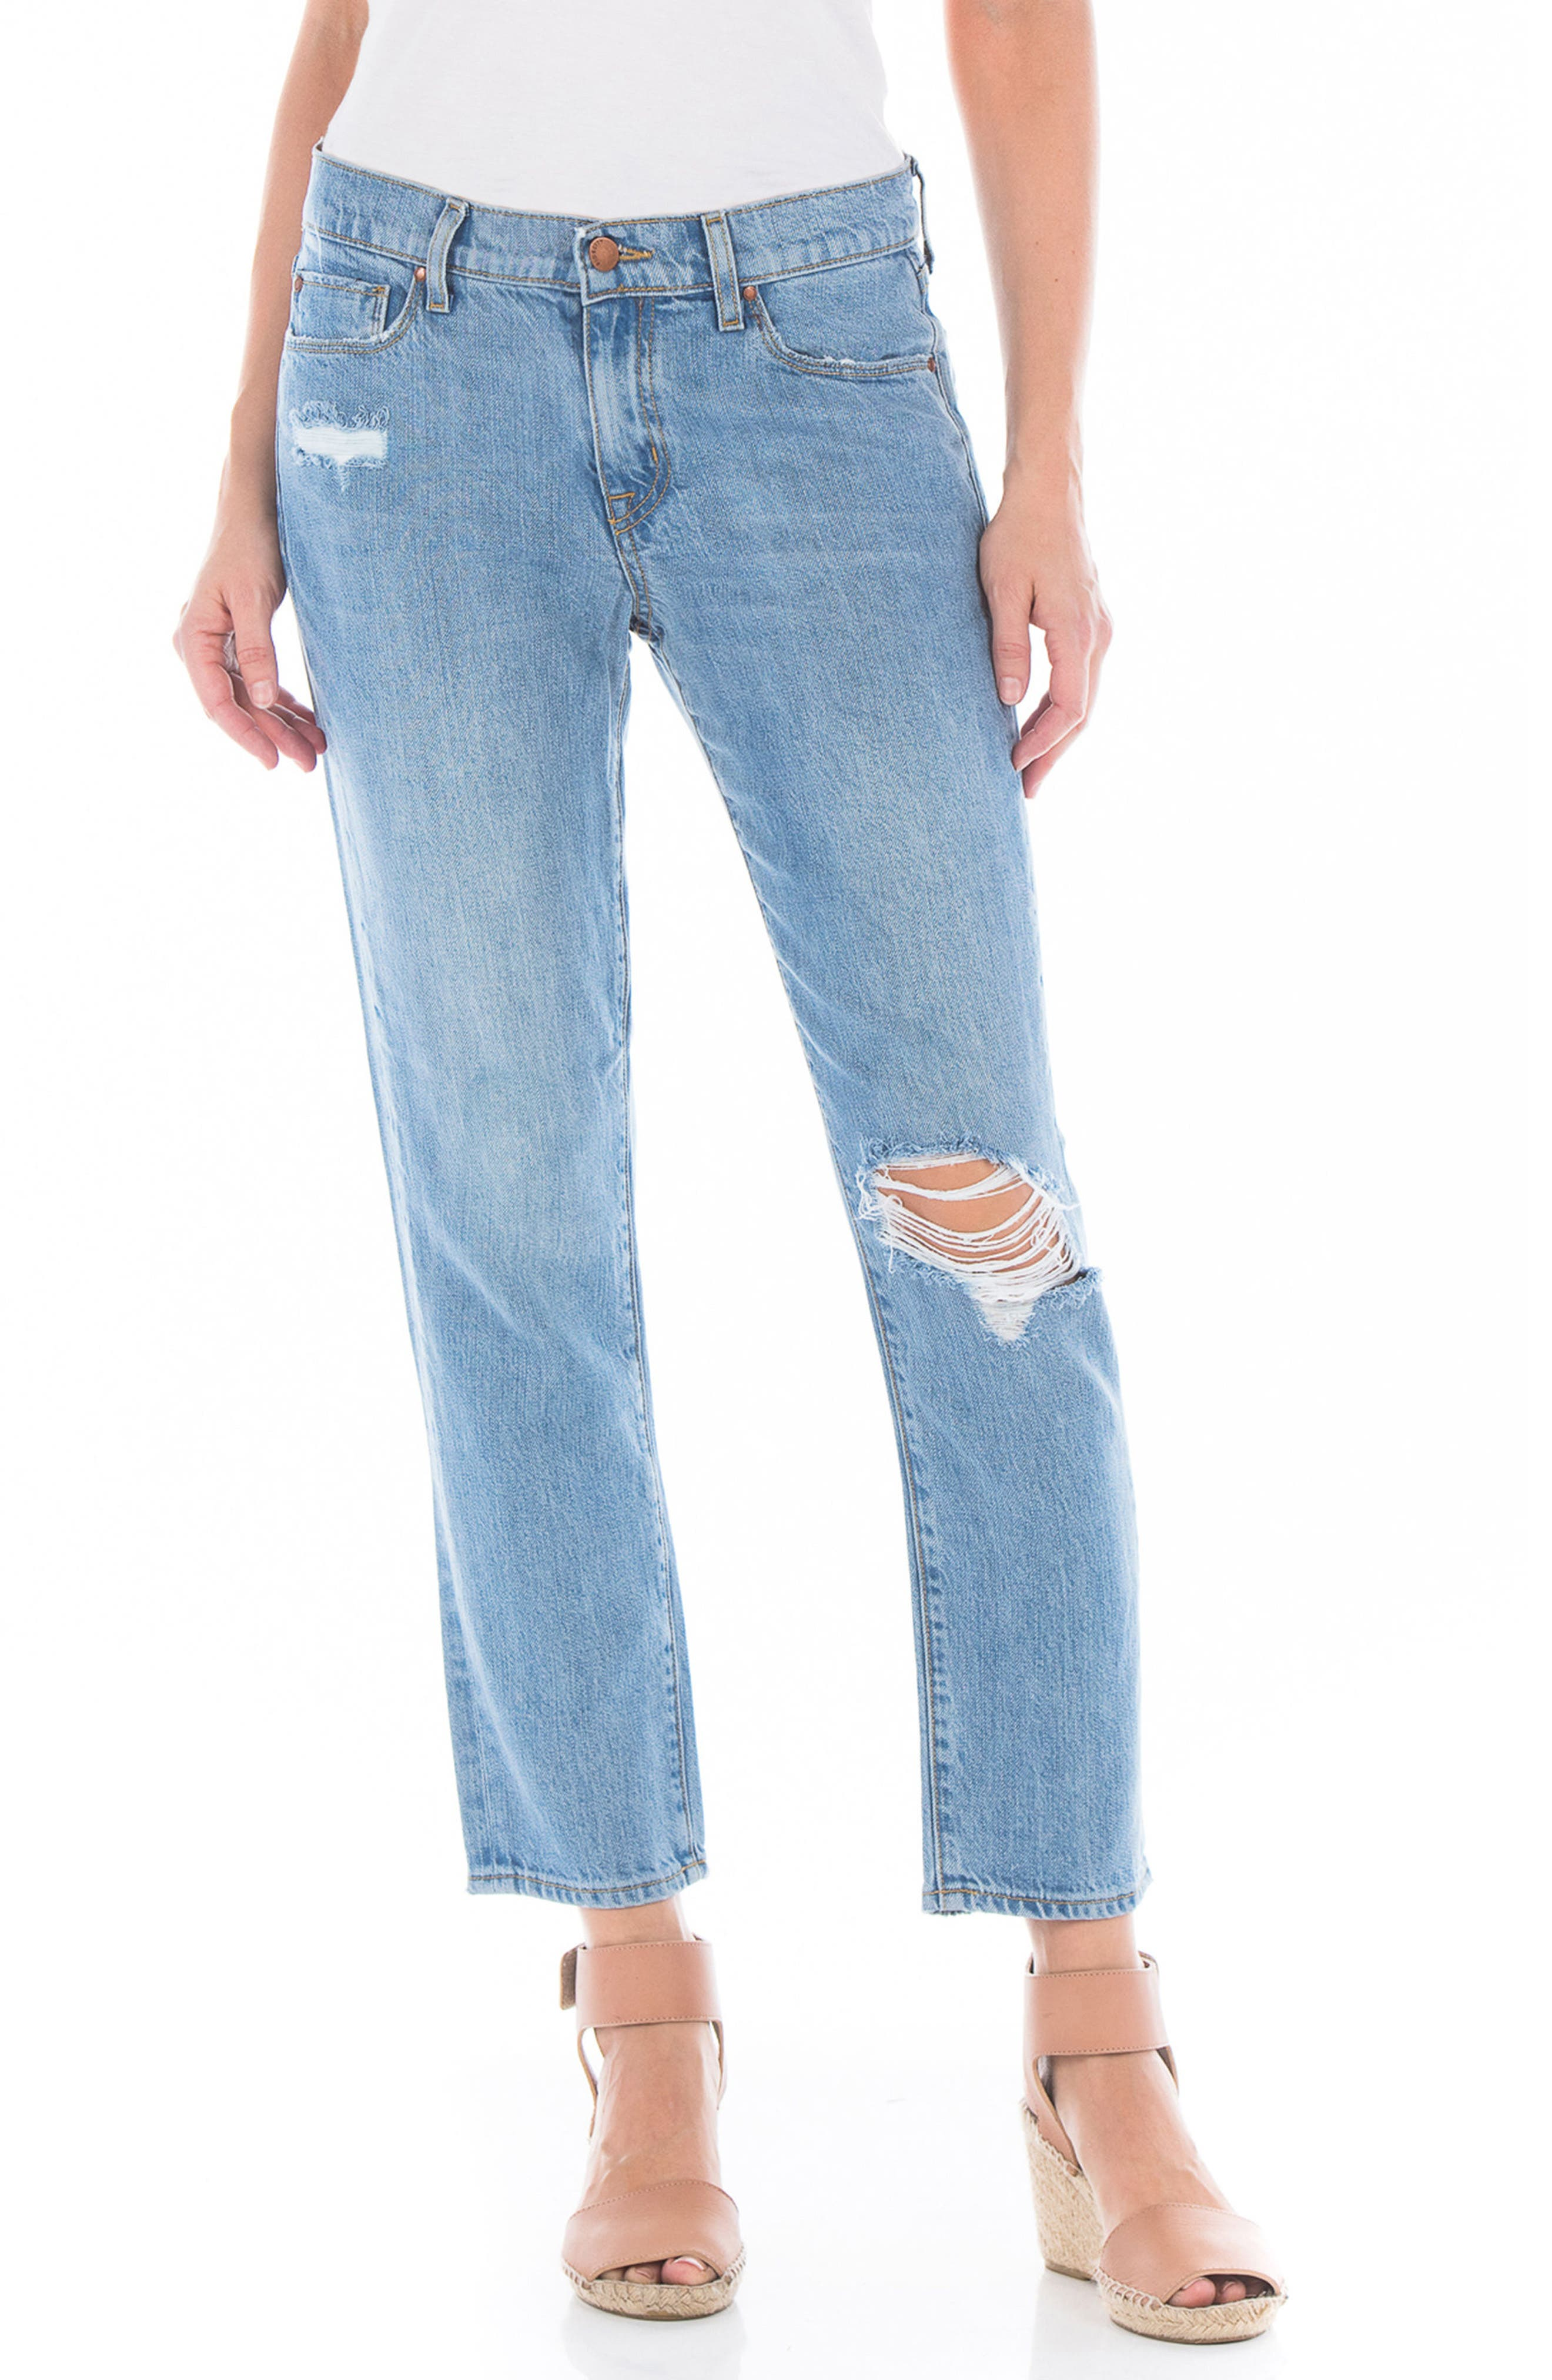 Fidelity Denim Axl Ripped Crop Girlfriend Jeans (Wild Thing)